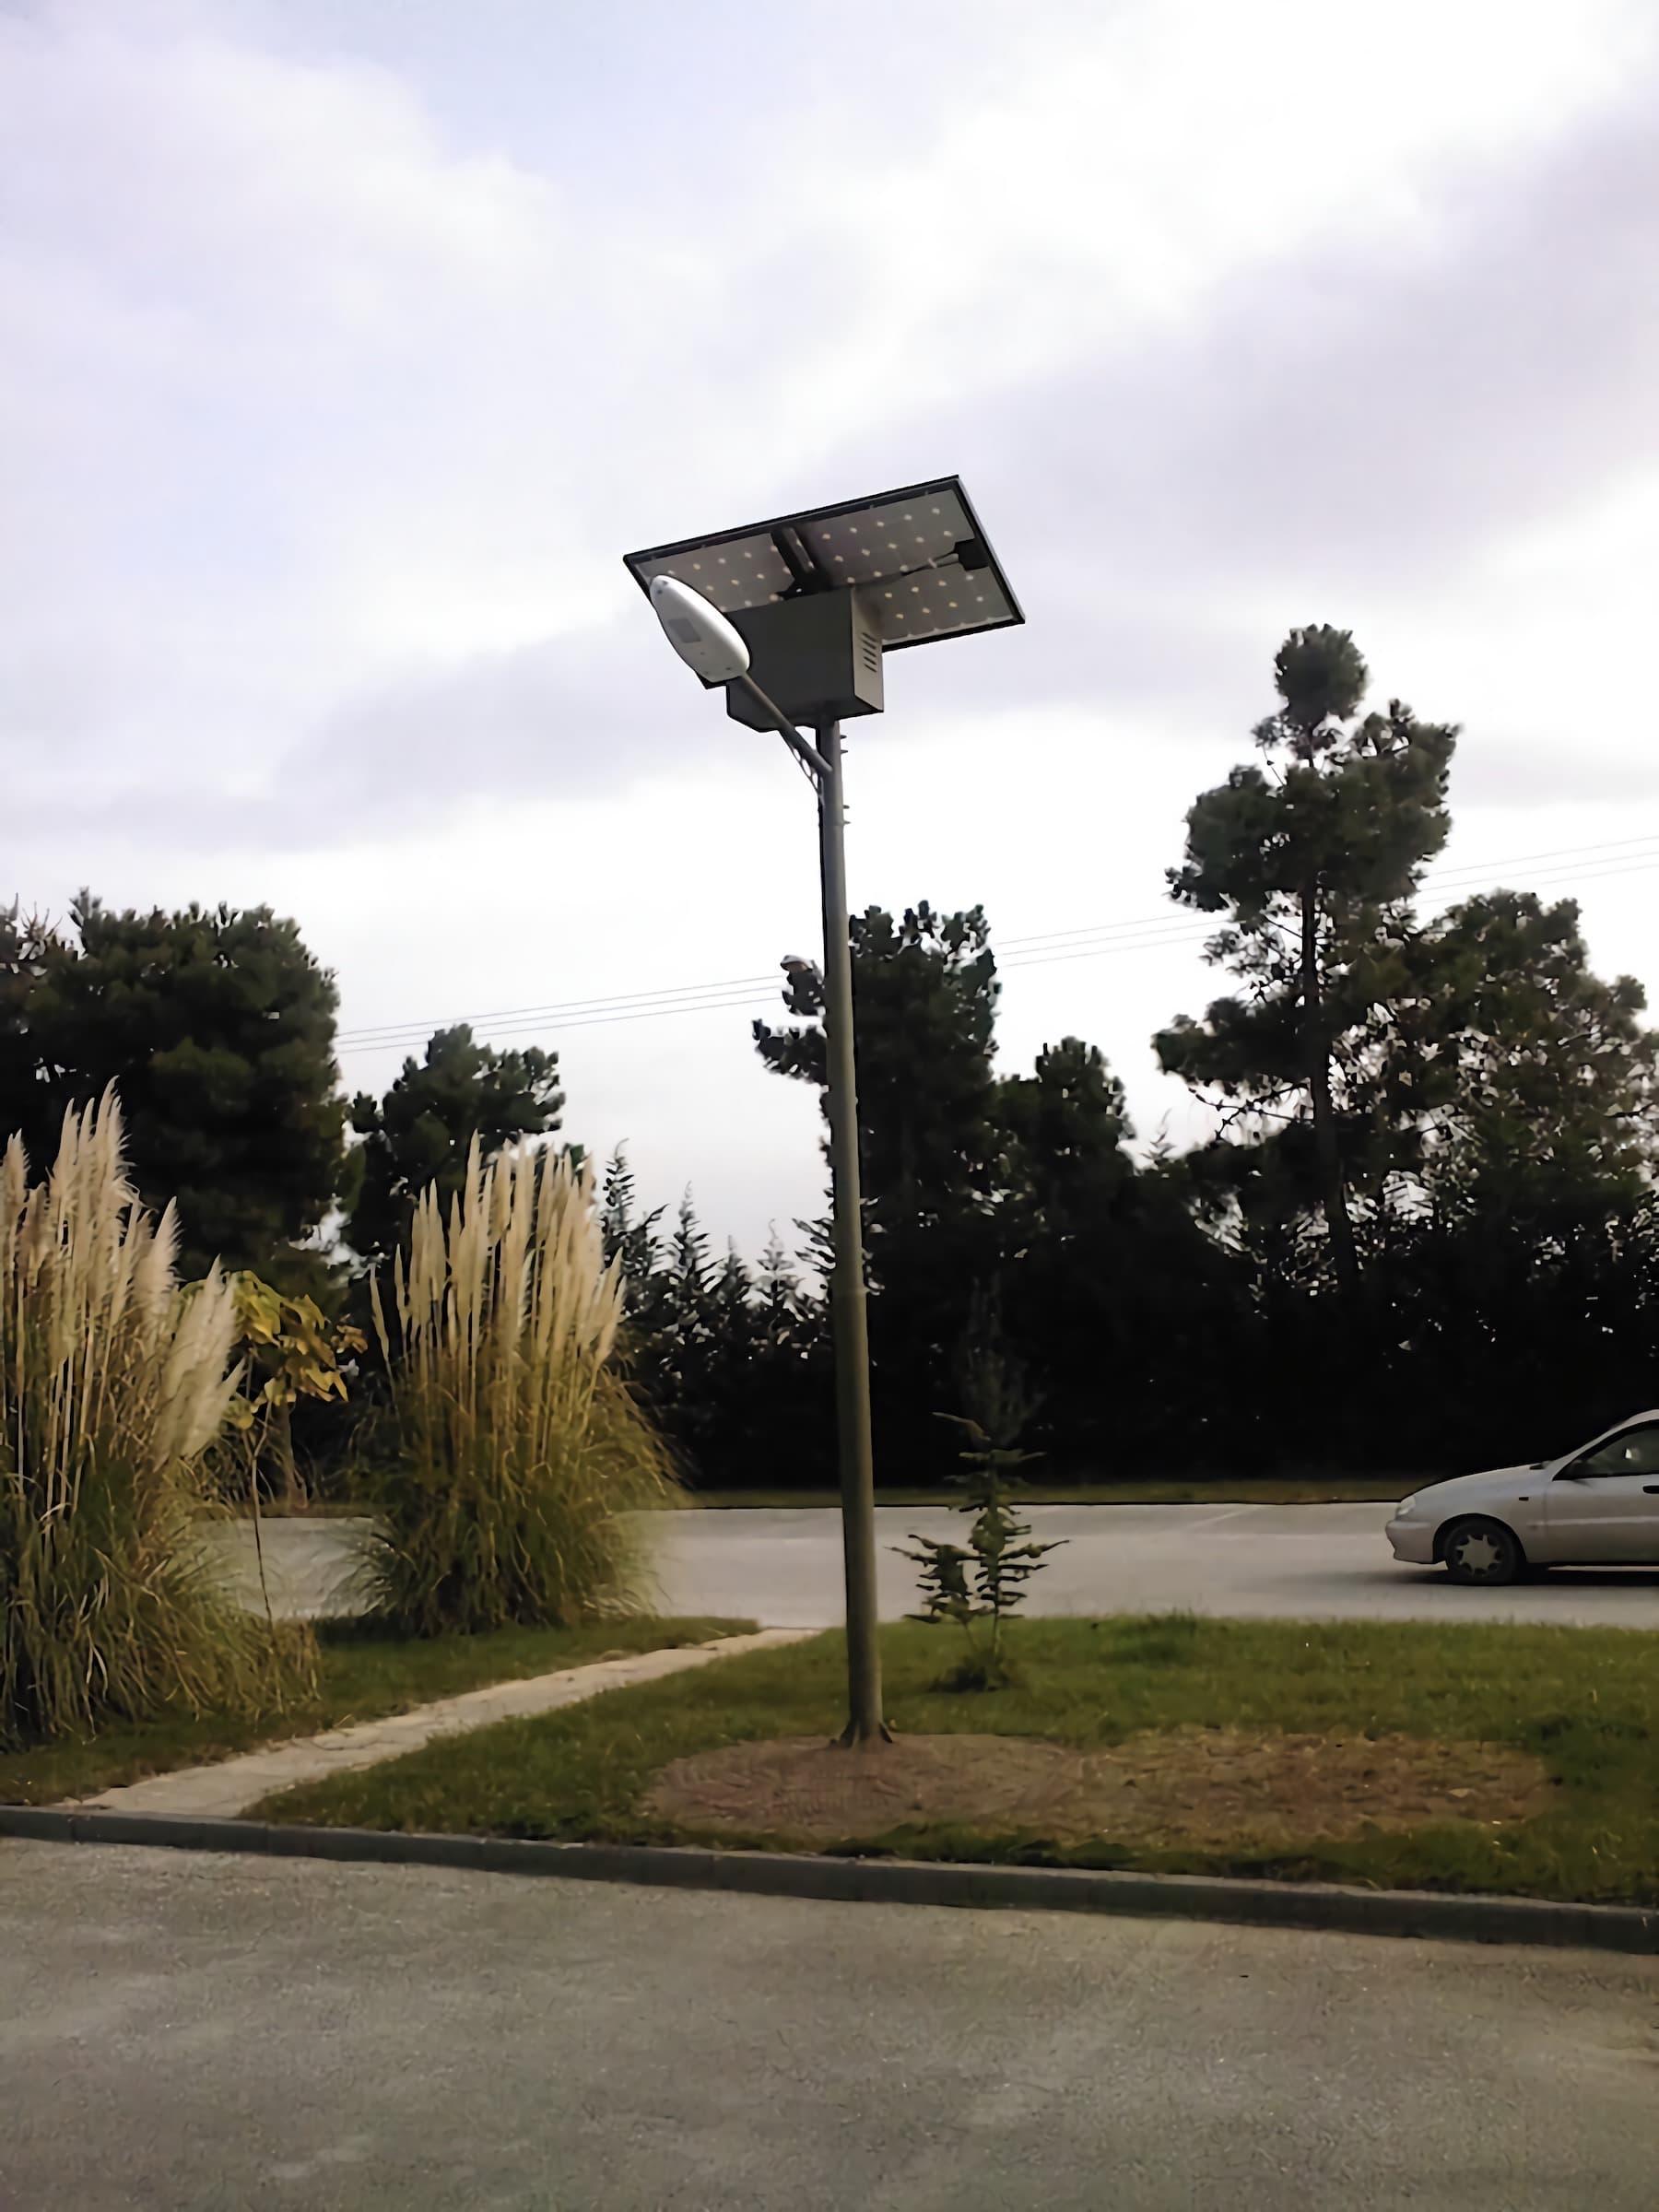 solar-street-light-split-type-35-watts-system-installation-in-Nigeria